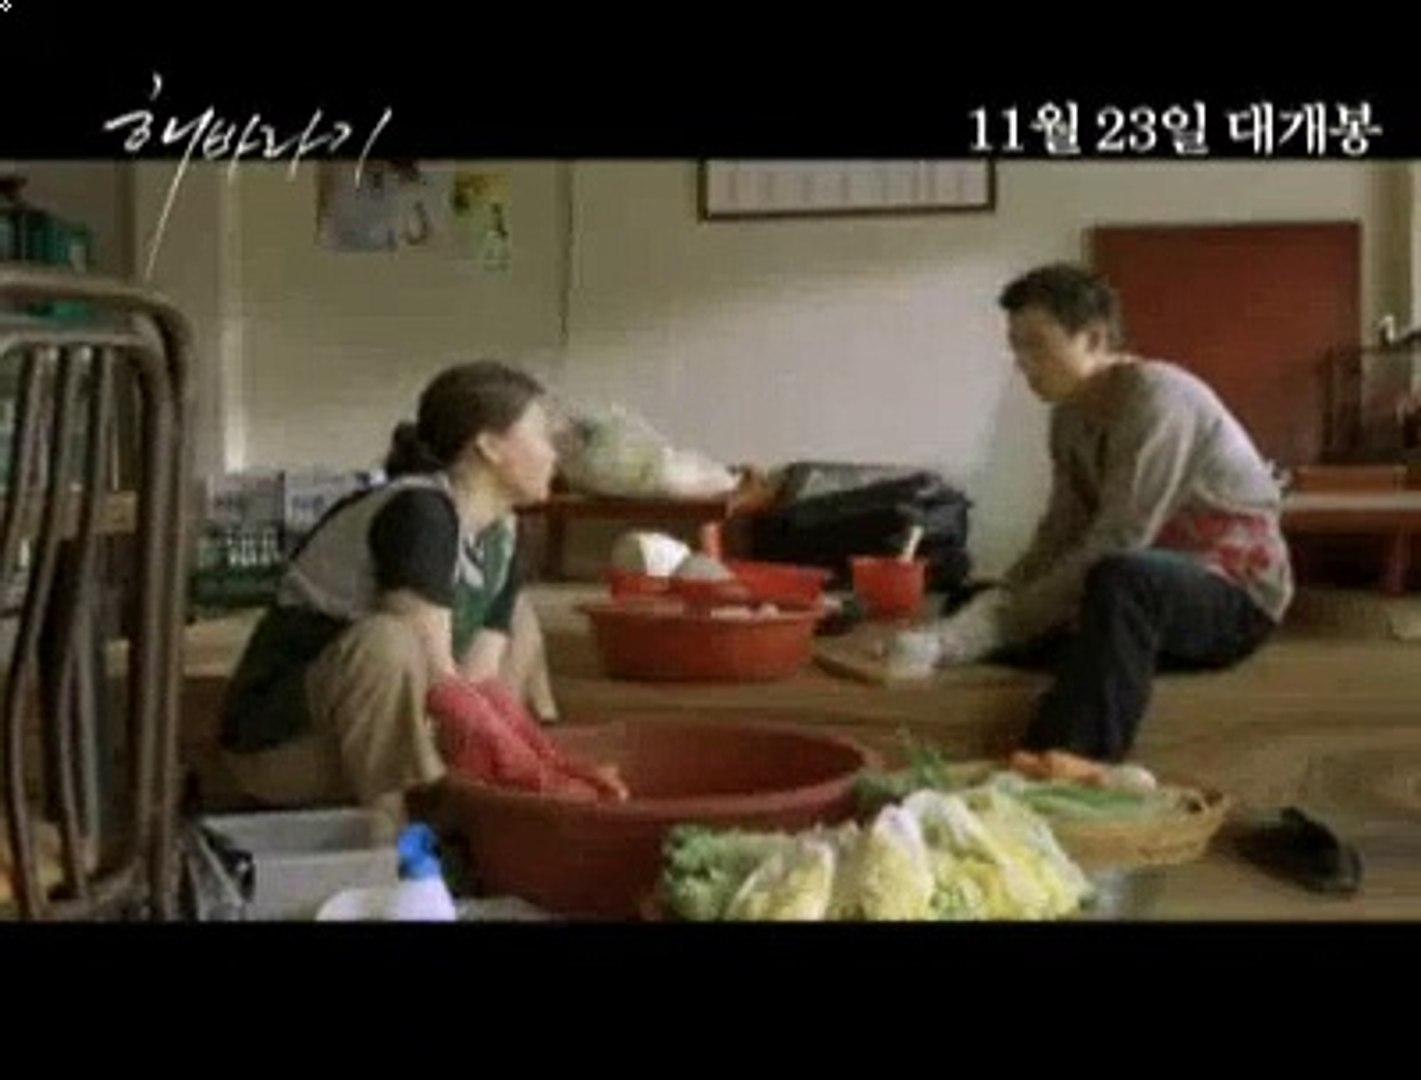 Sunflower Korean Movie Trailer Vídeo Dailymotion